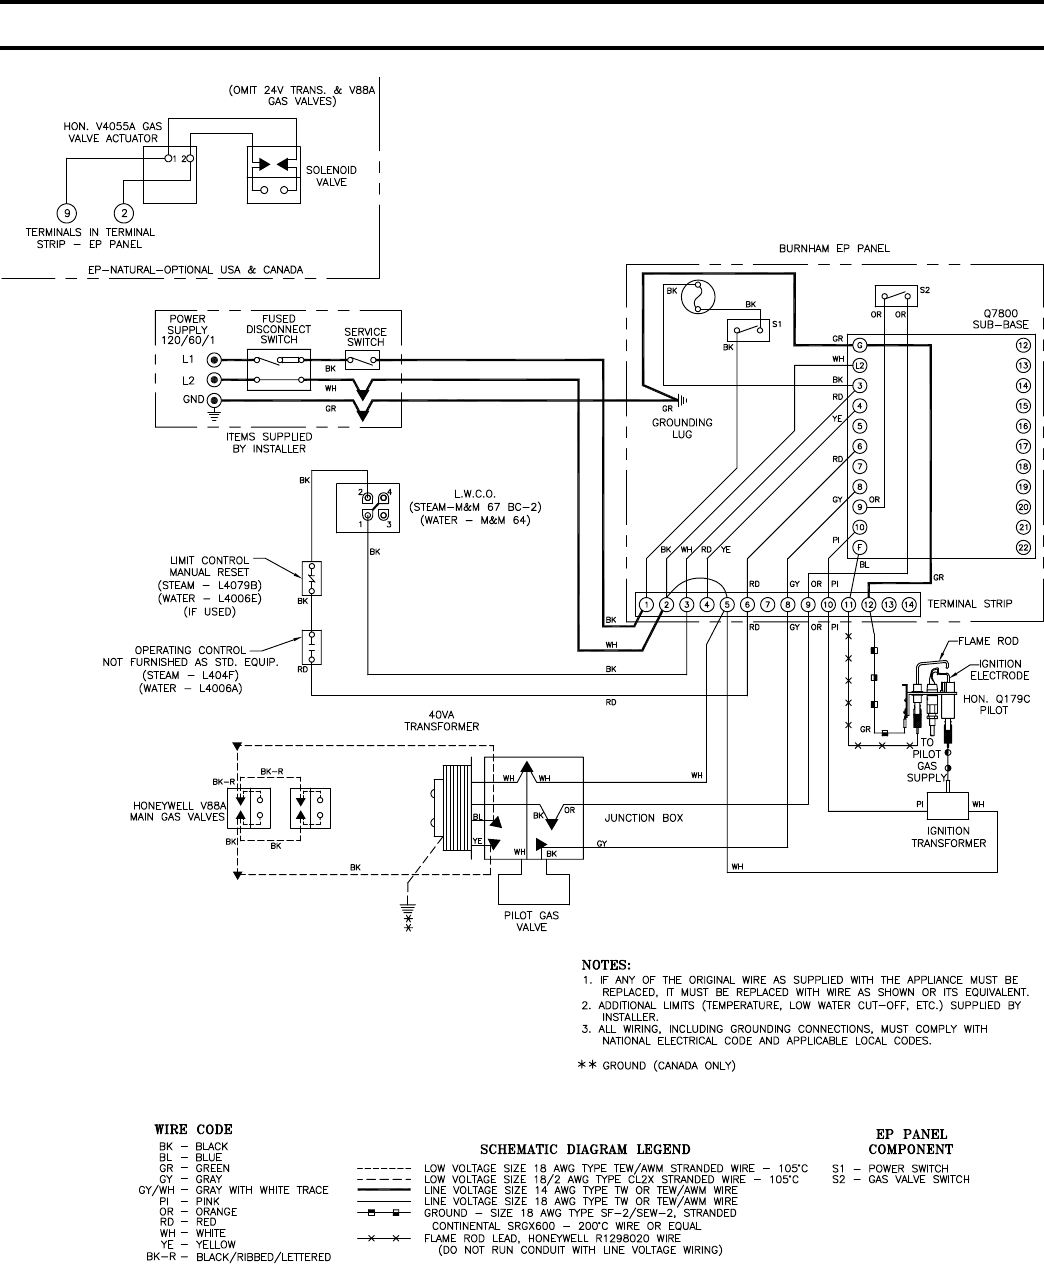 burnham series 5b boiler installation operating instructions. Black Bedroom Furniture Sets. Home Design Ideas